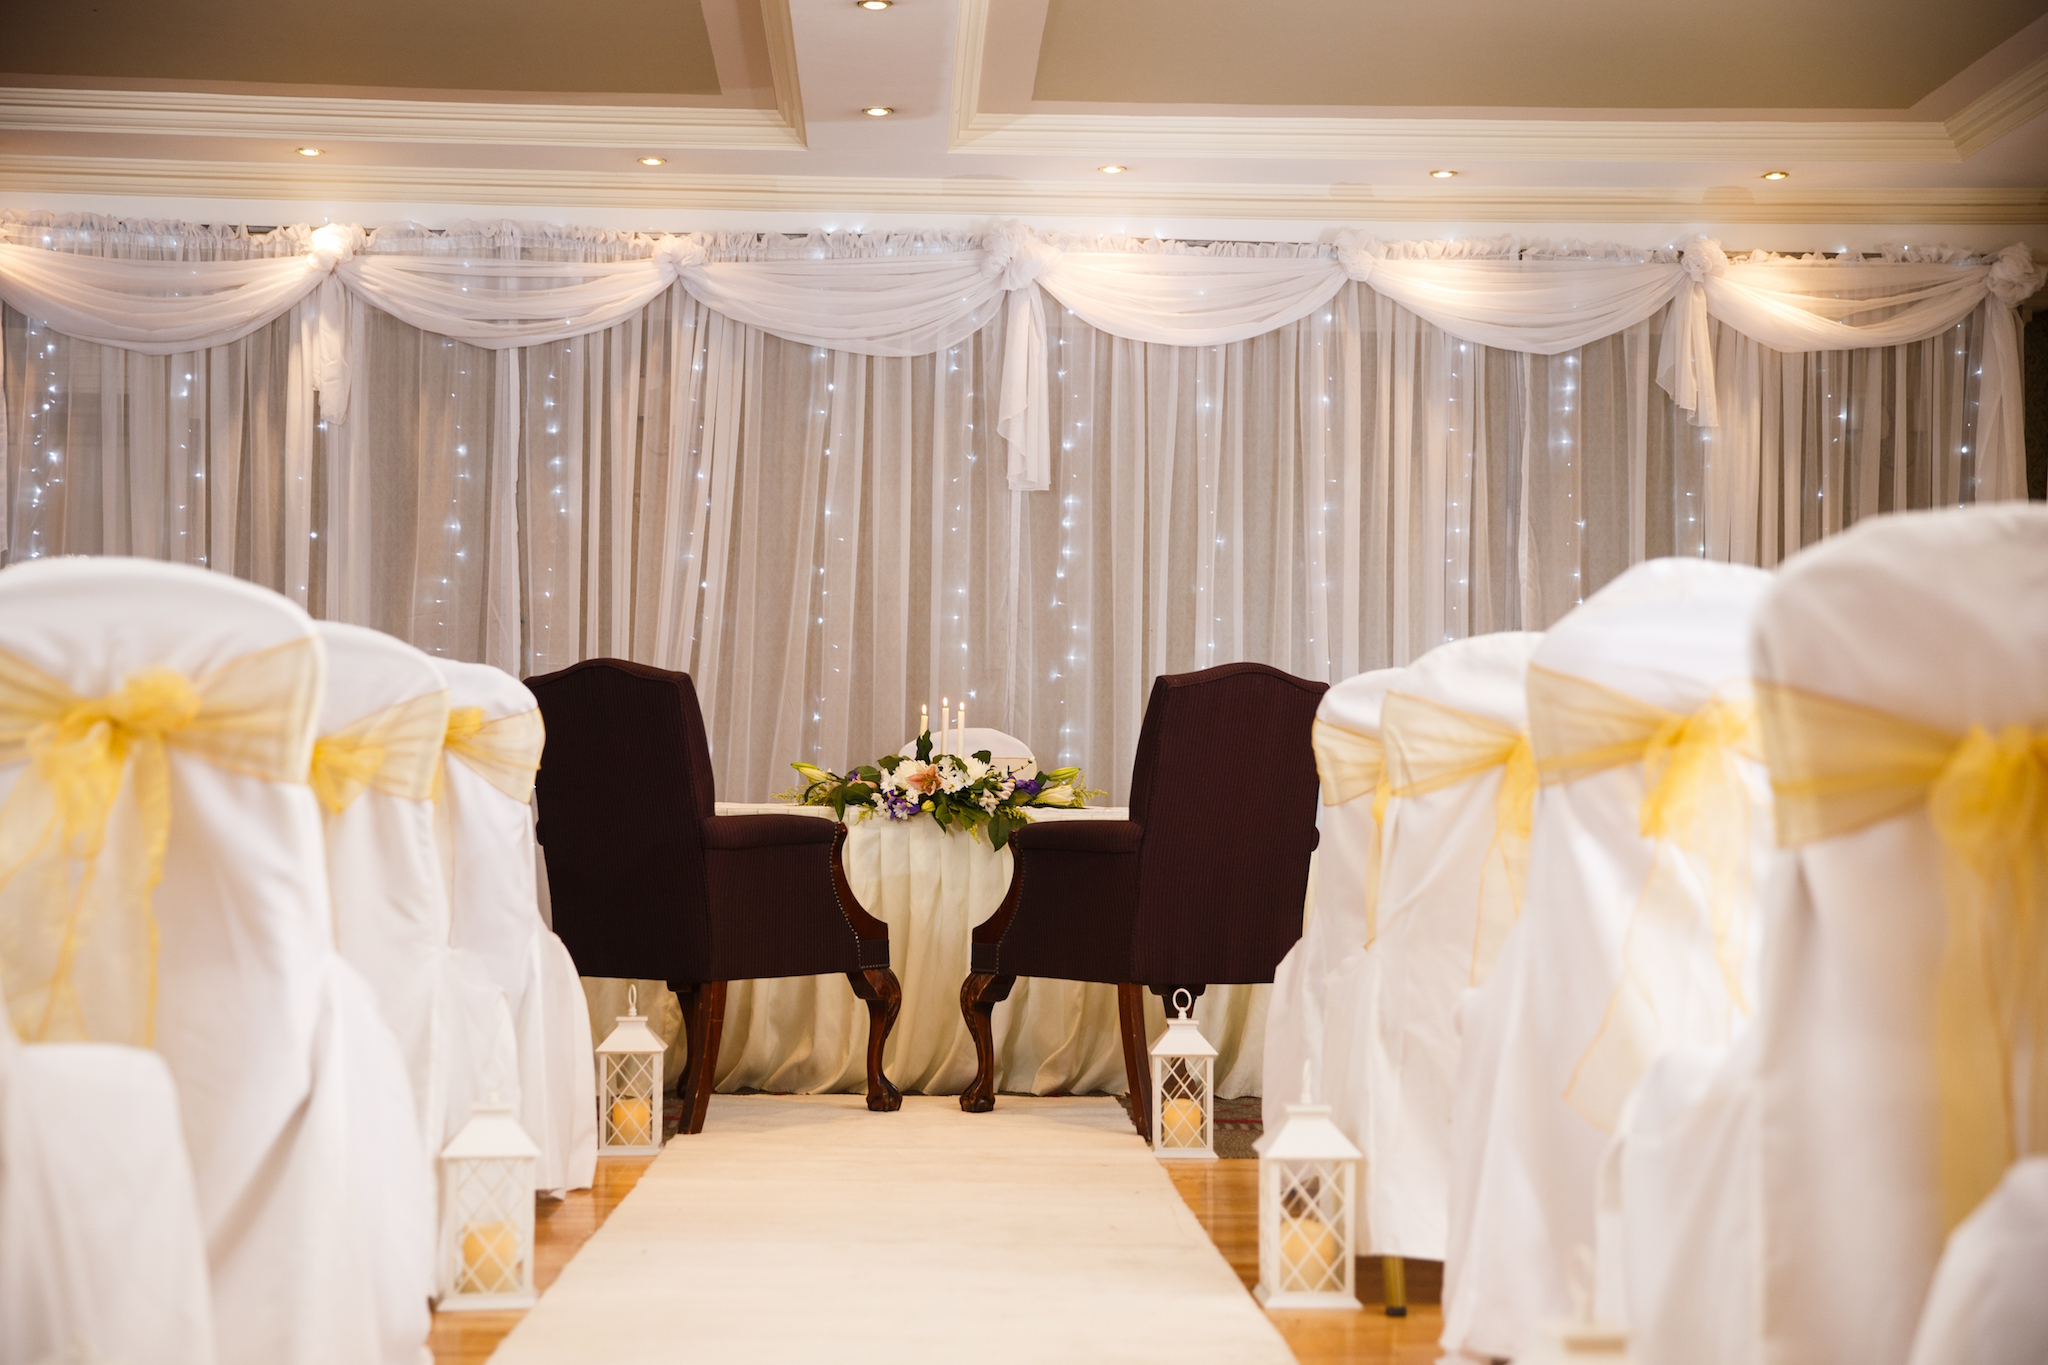 Castle Marriage Venues Hotel Rooms